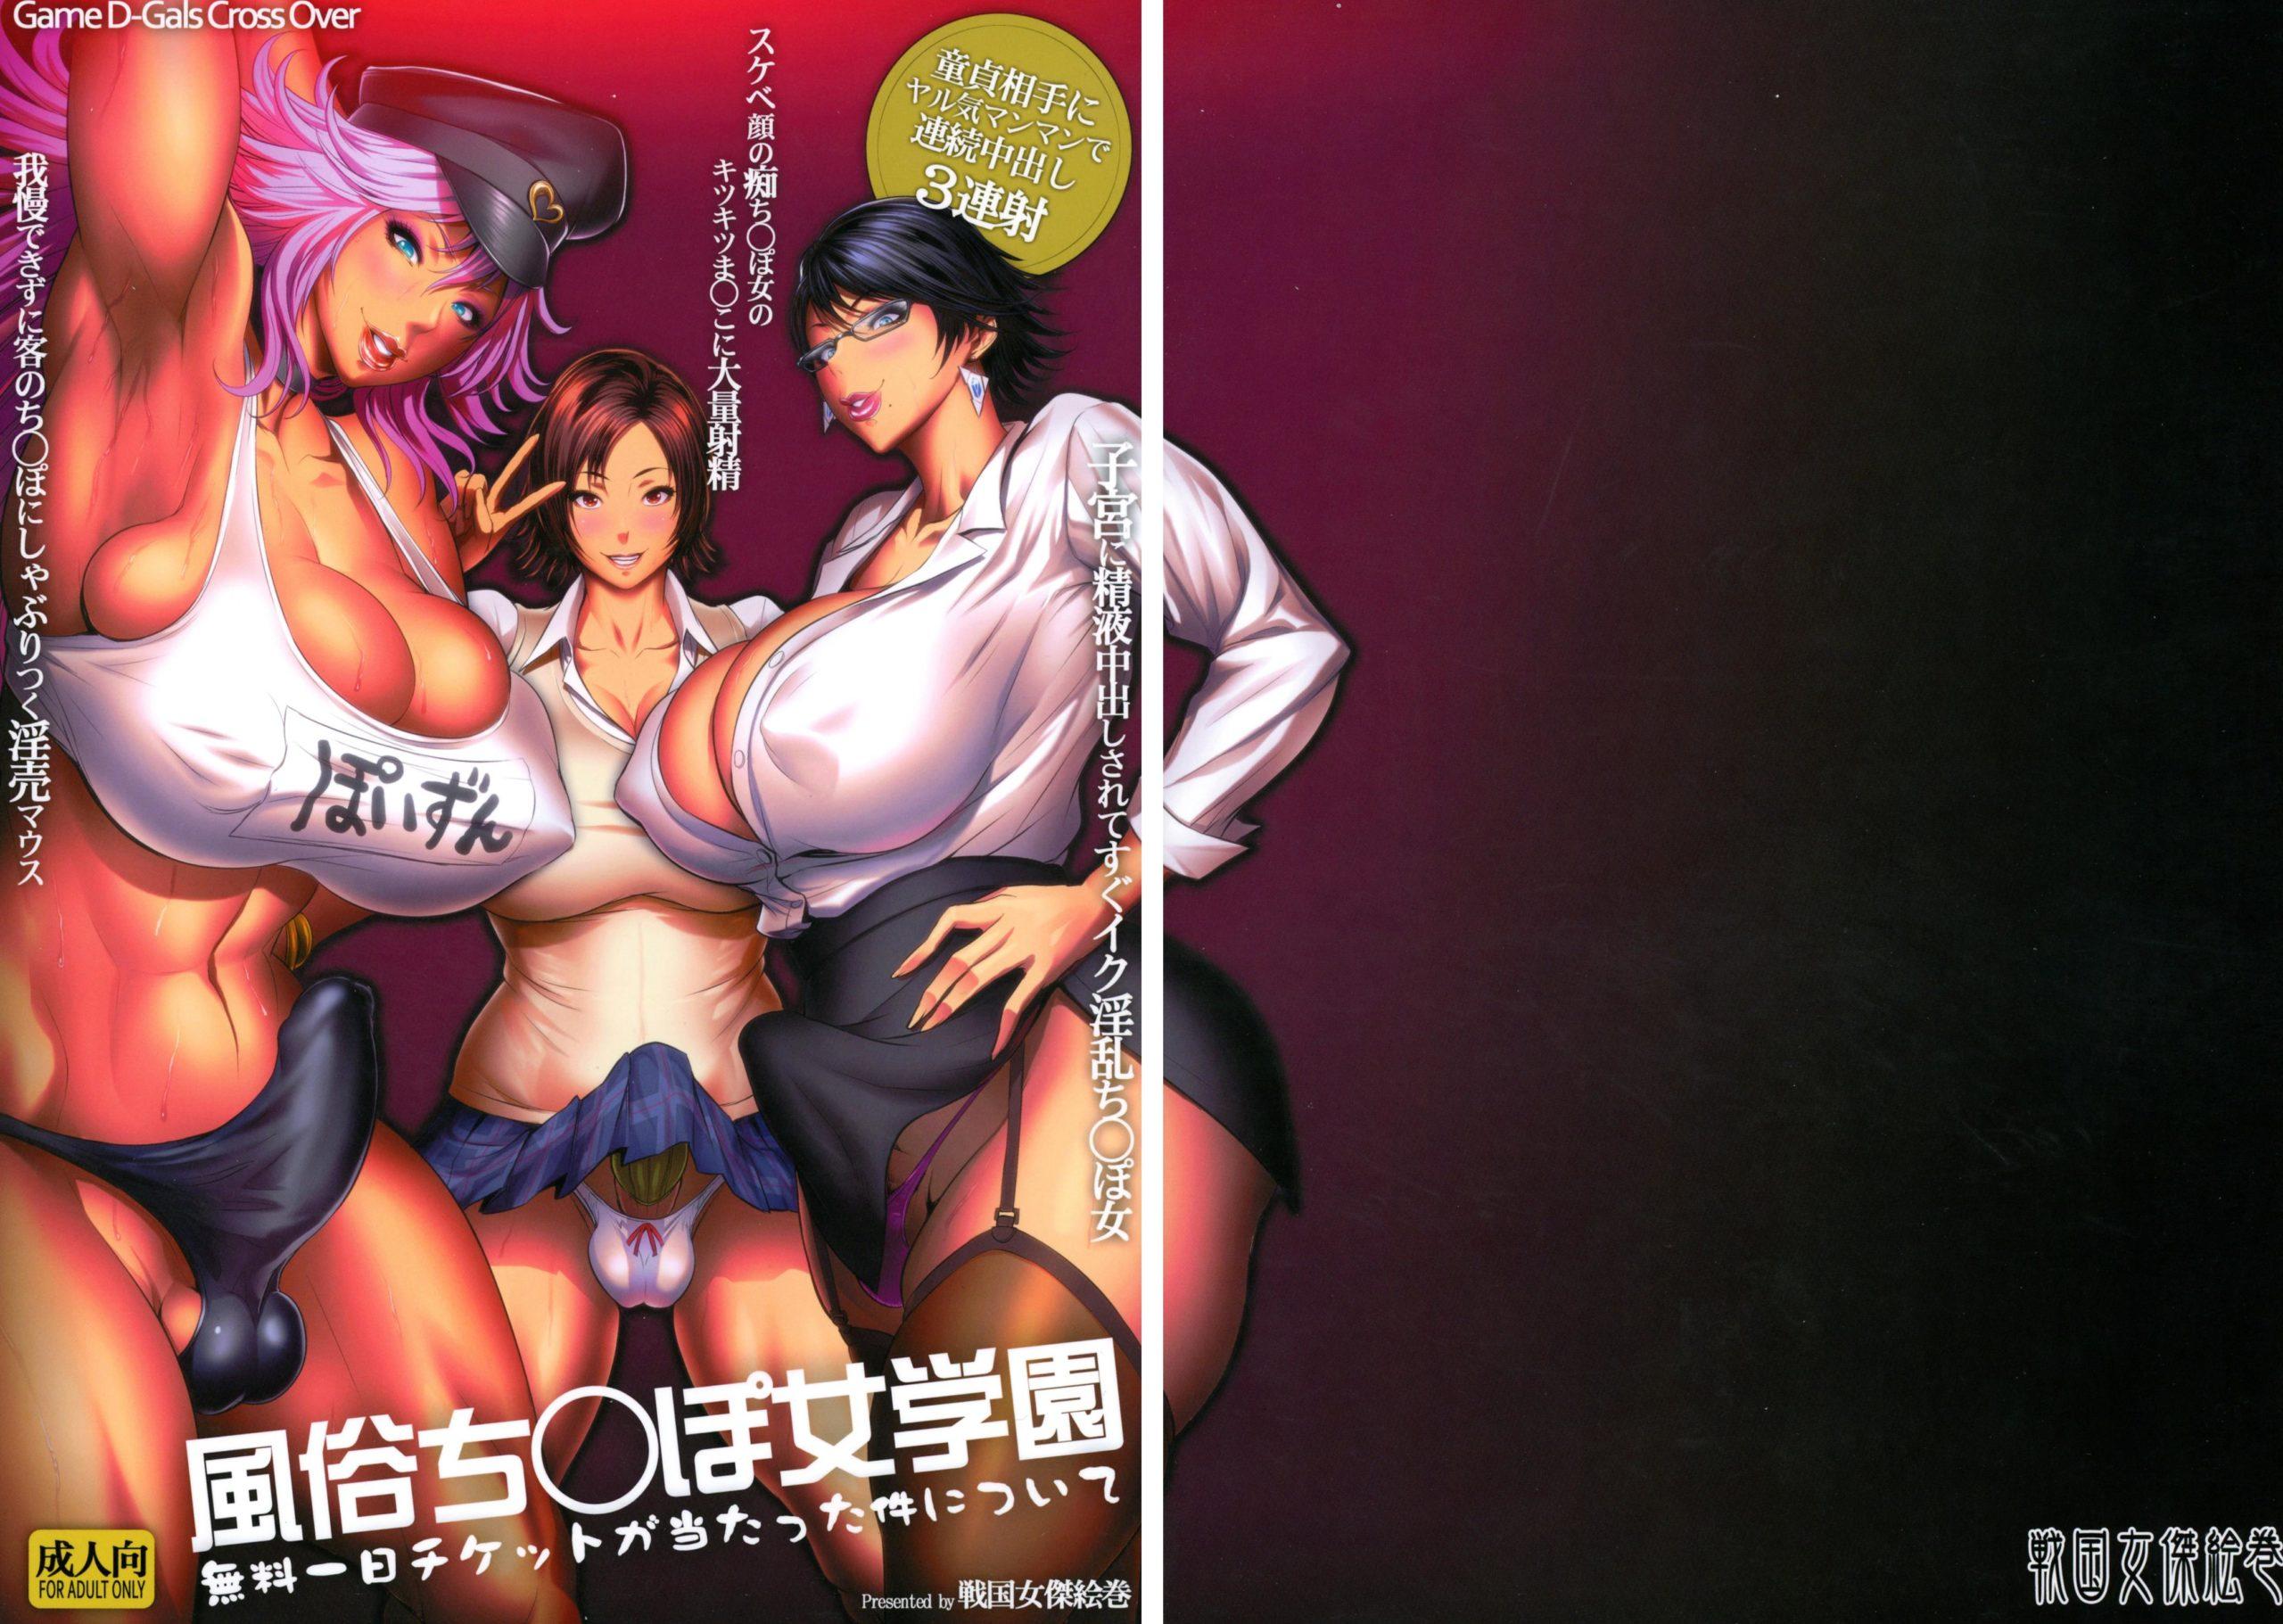 Sexy Penis Women Academy (Street Fighter) - Foto 1